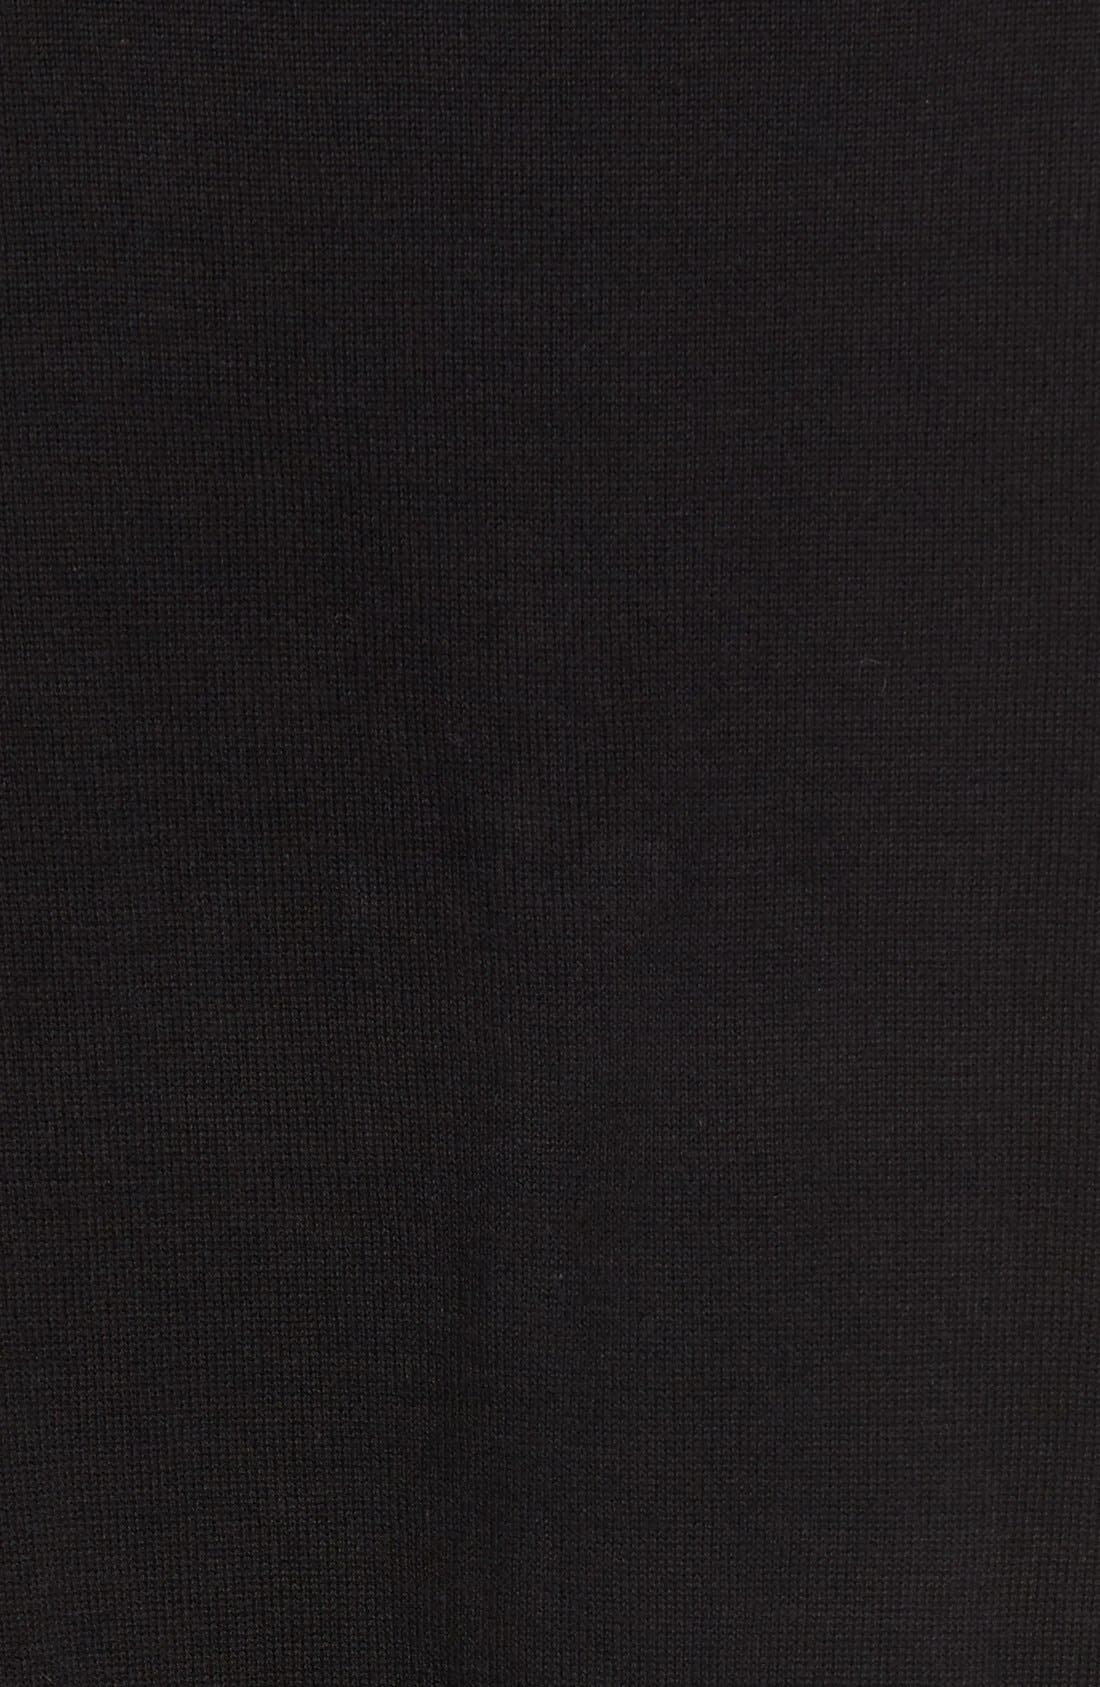 Nylon Trim Pullover,                             Alternate thumbnail 5, color,                             001